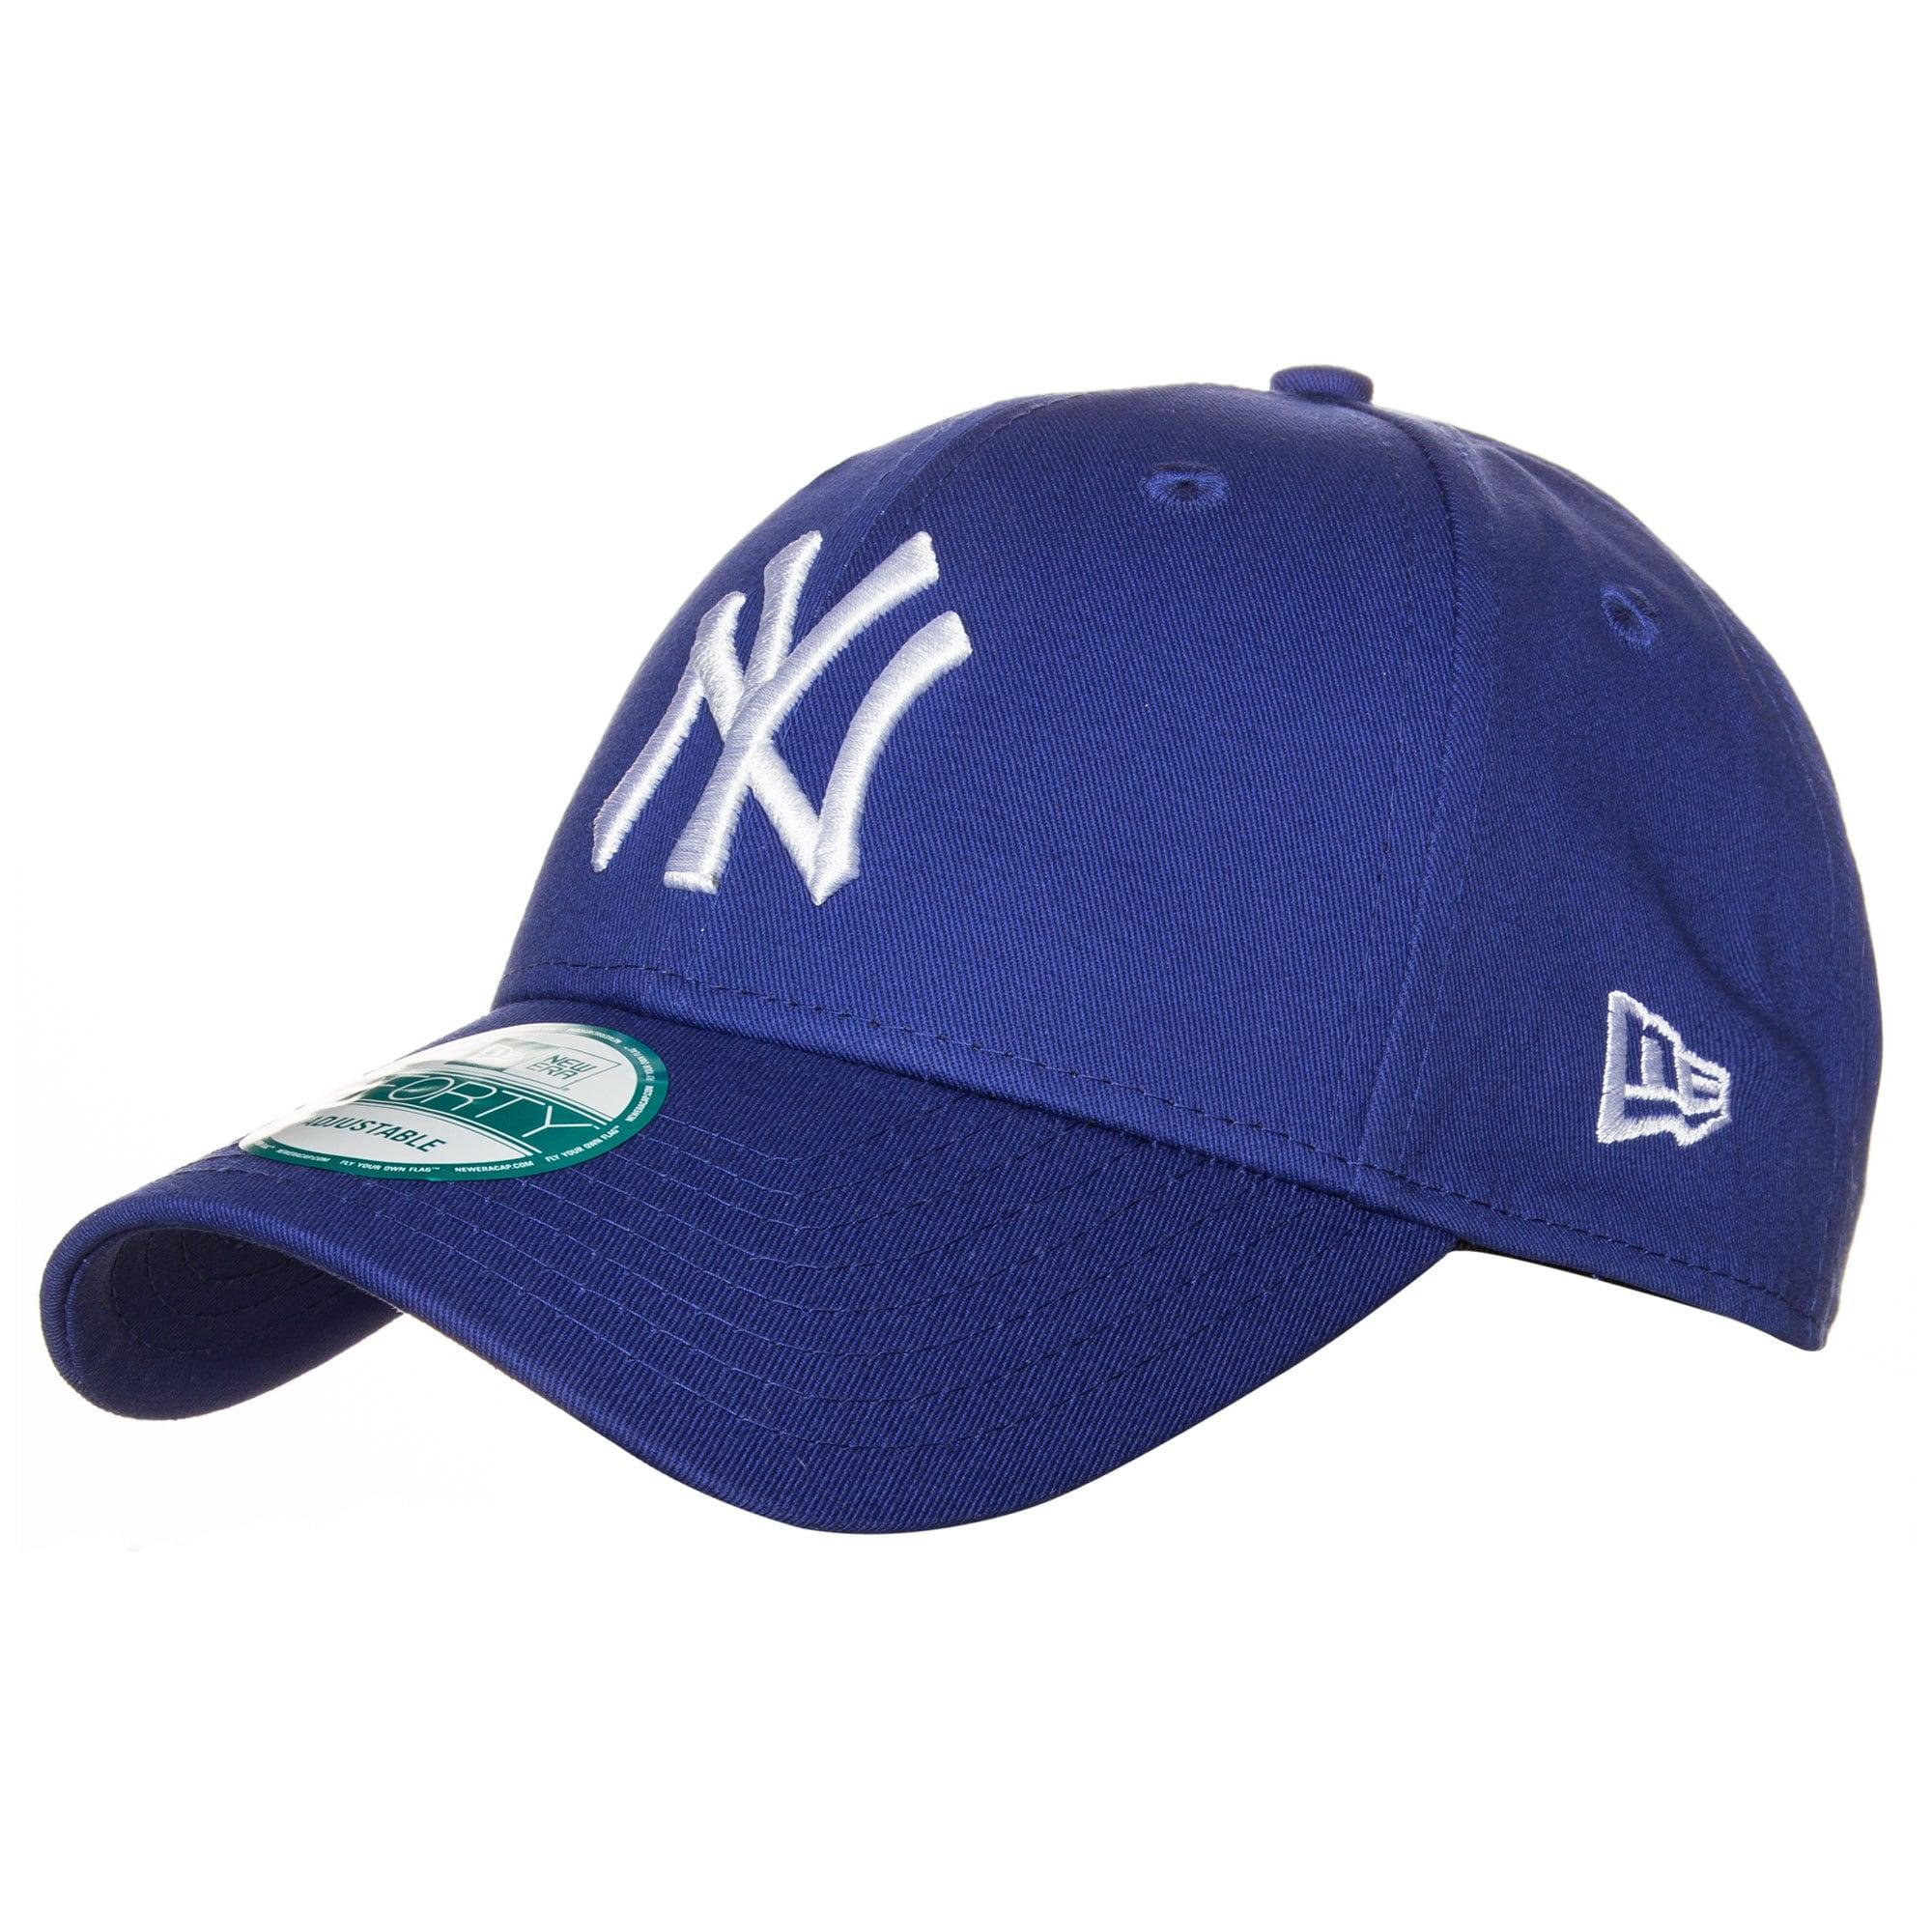 Kšiltovka 9Forty League Basic modrá bílá NEW ERA